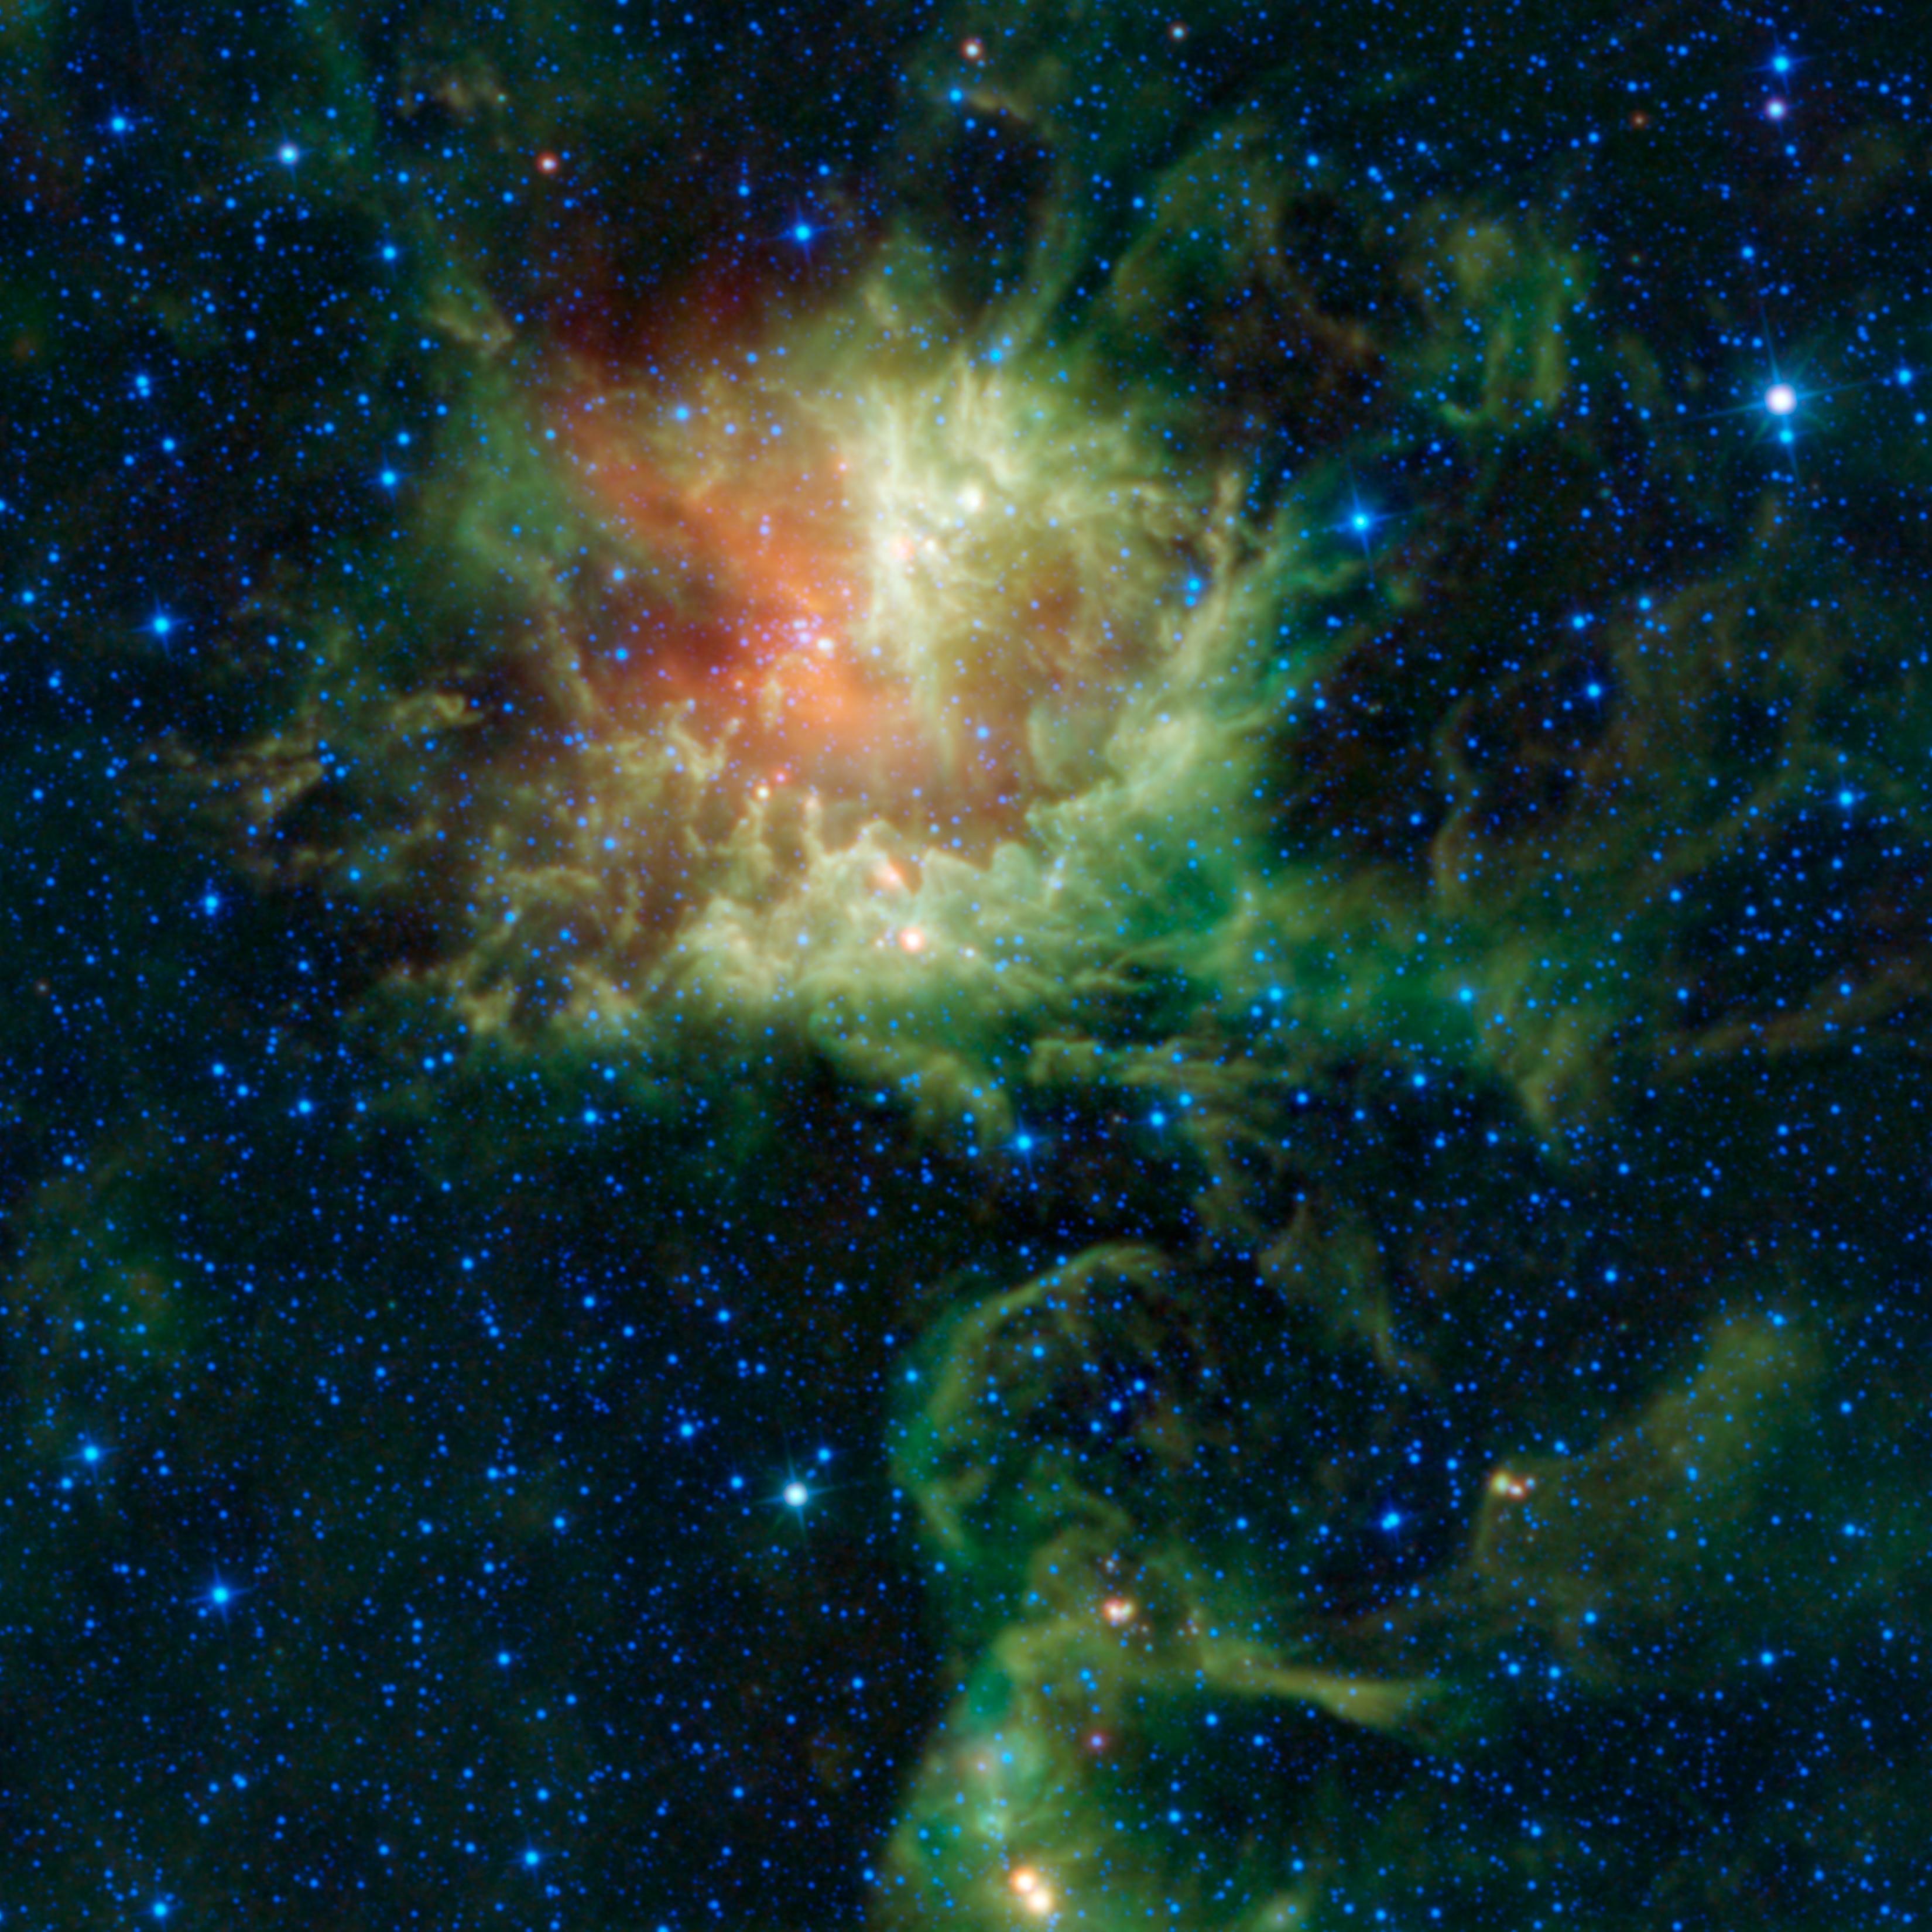 'Pacman' Nebula Grows Teeth to Chomp on Space